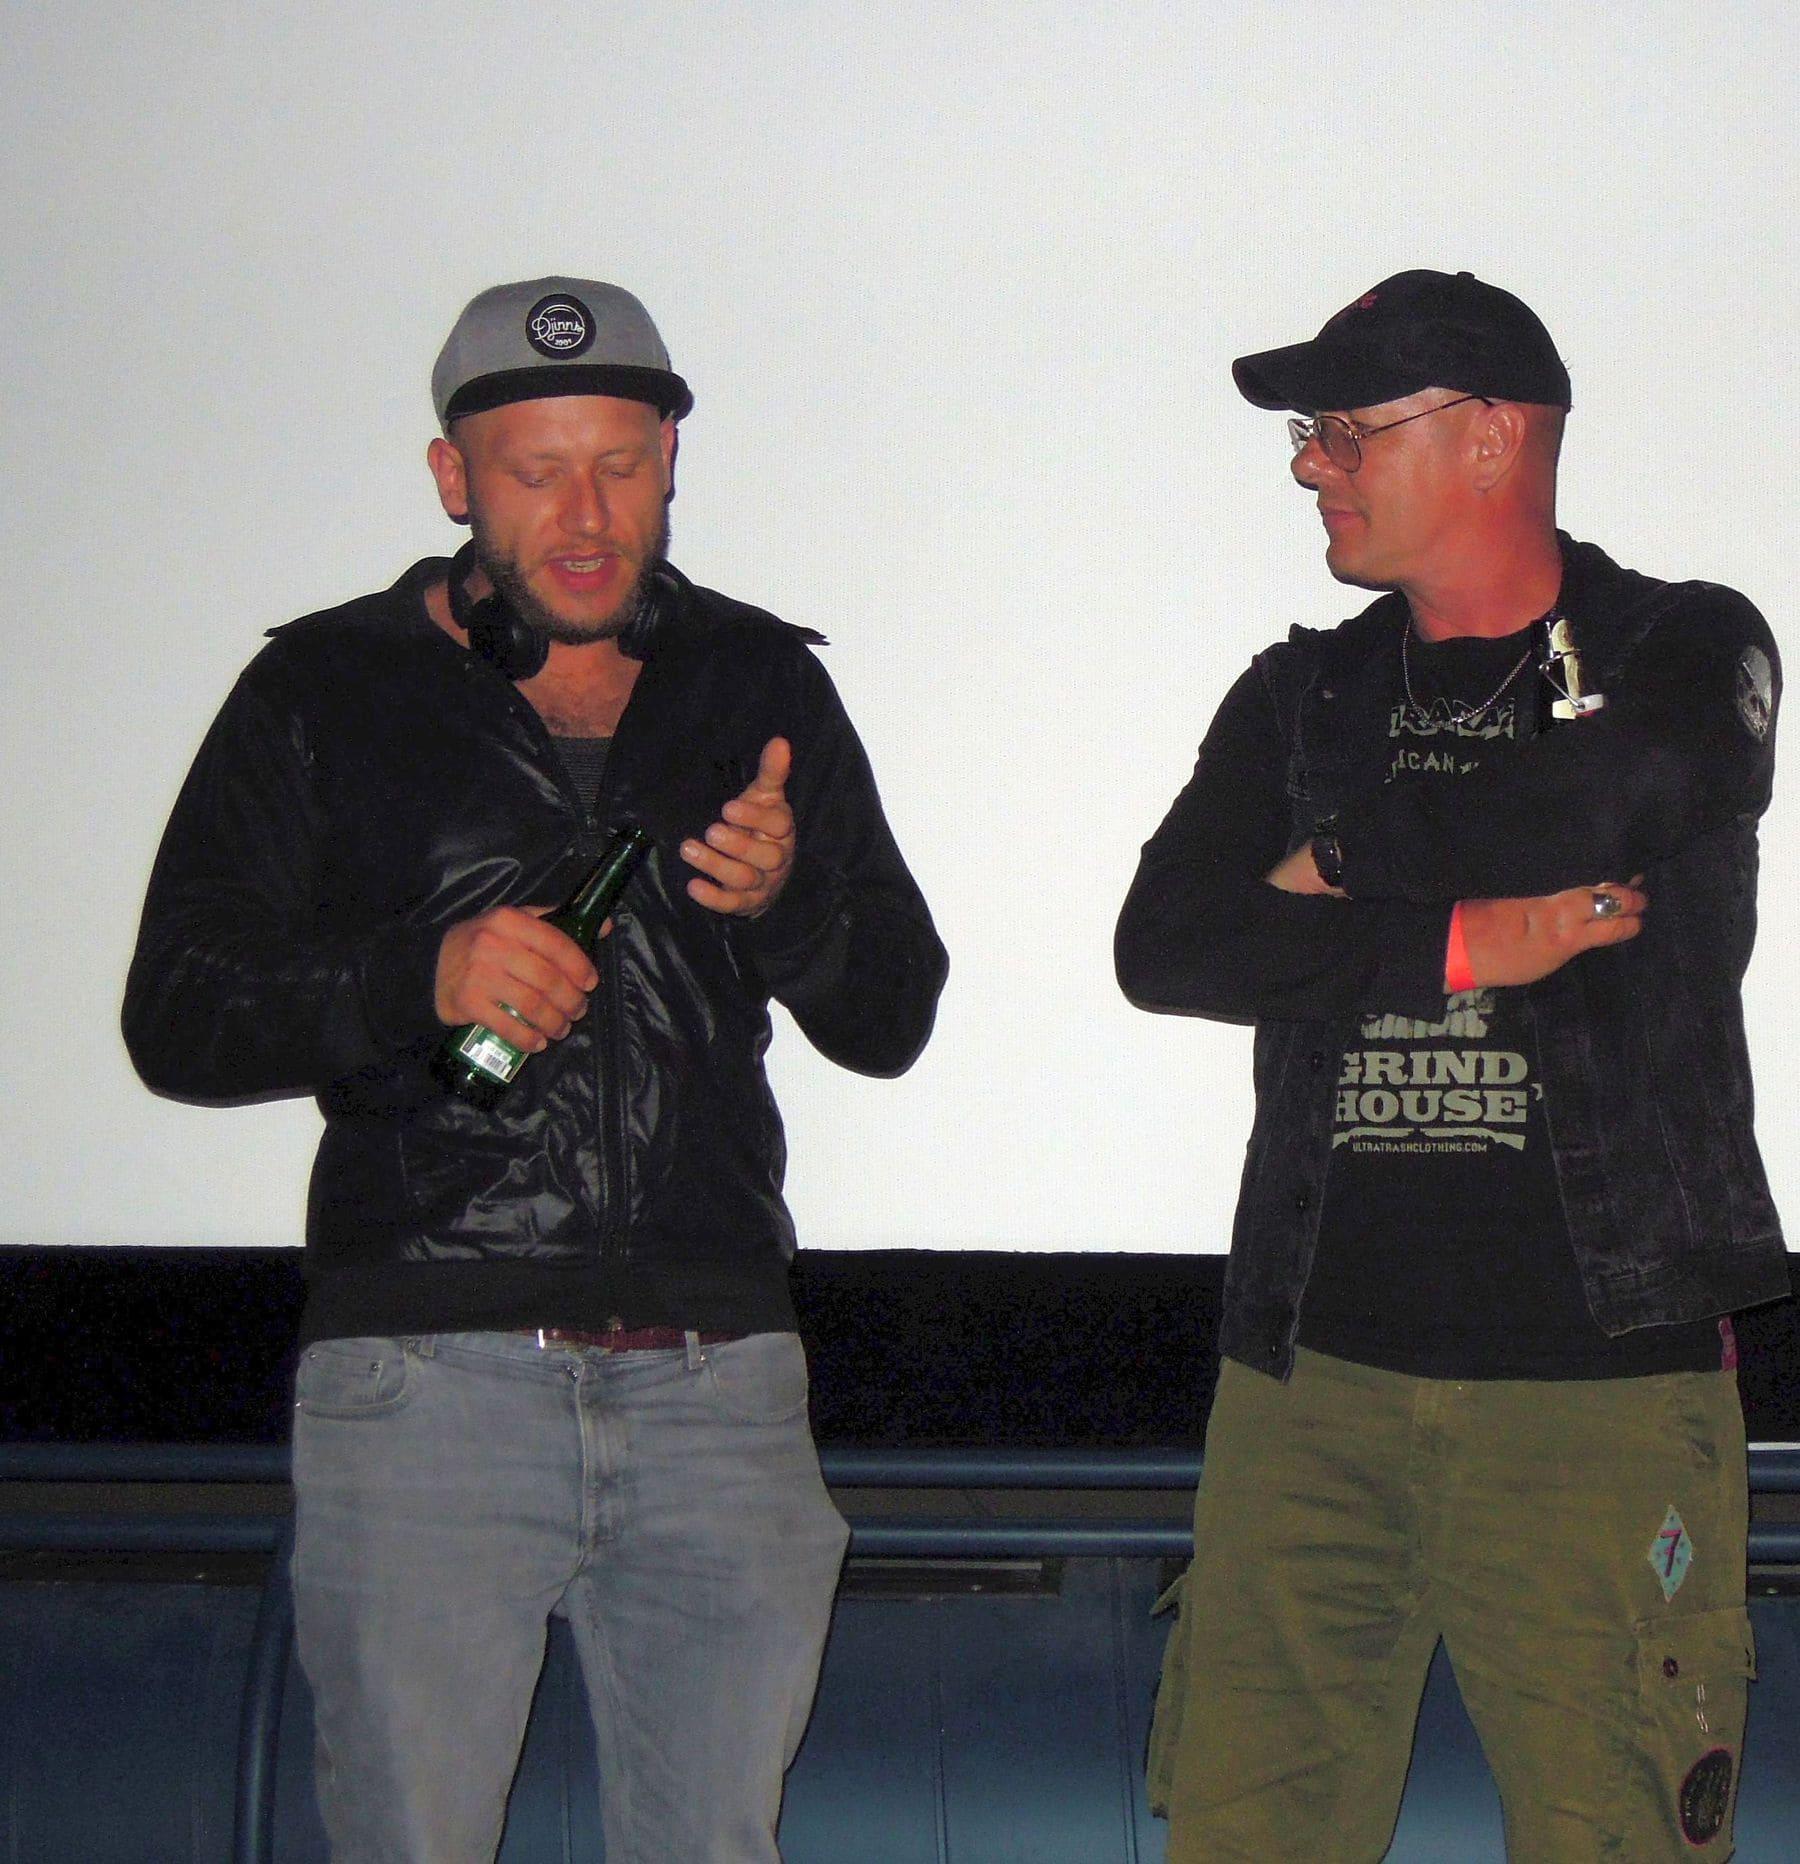 Andreas Rimkus und Uwe Choroba - UNCUT POLICE 2